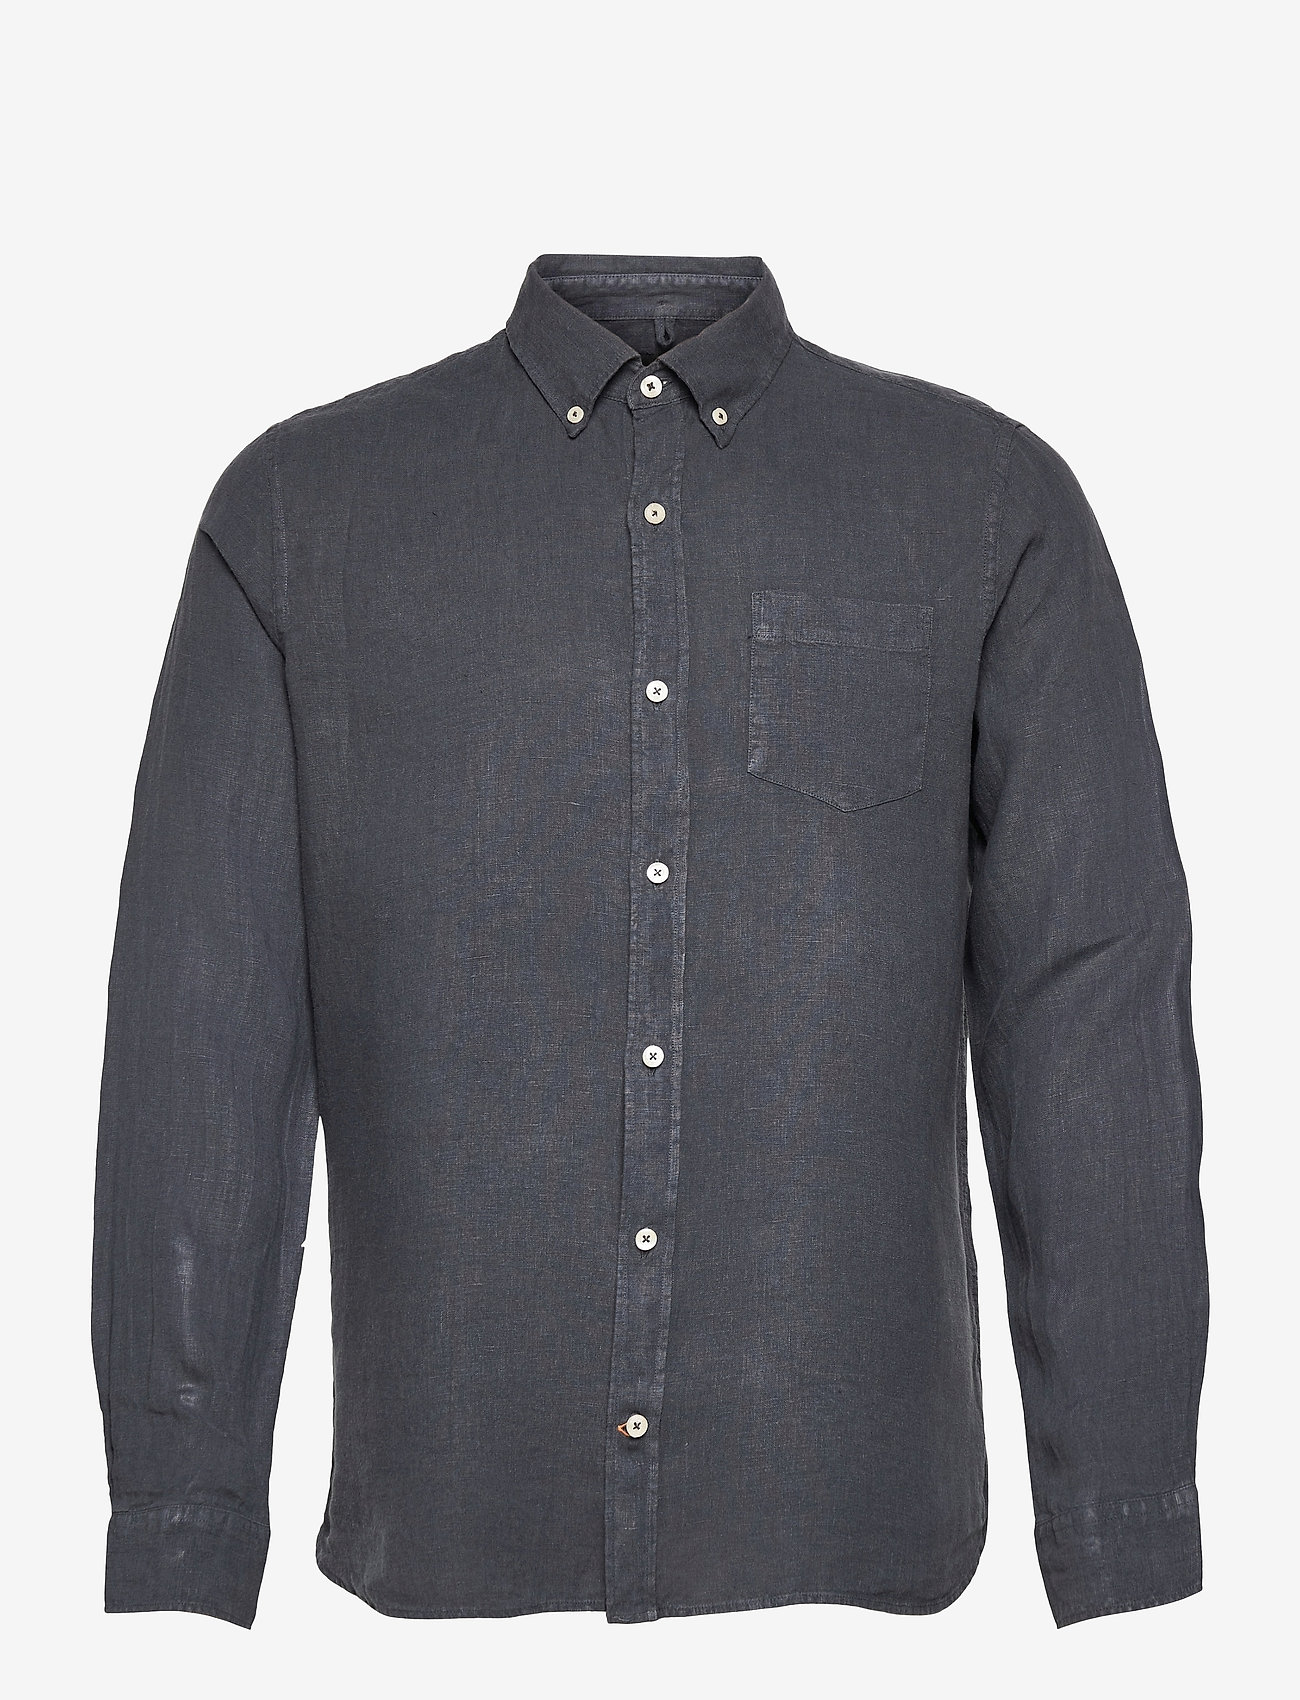 ECOALF - MALIBU SHIRT MAN - geruite overhemden - caviar - 0